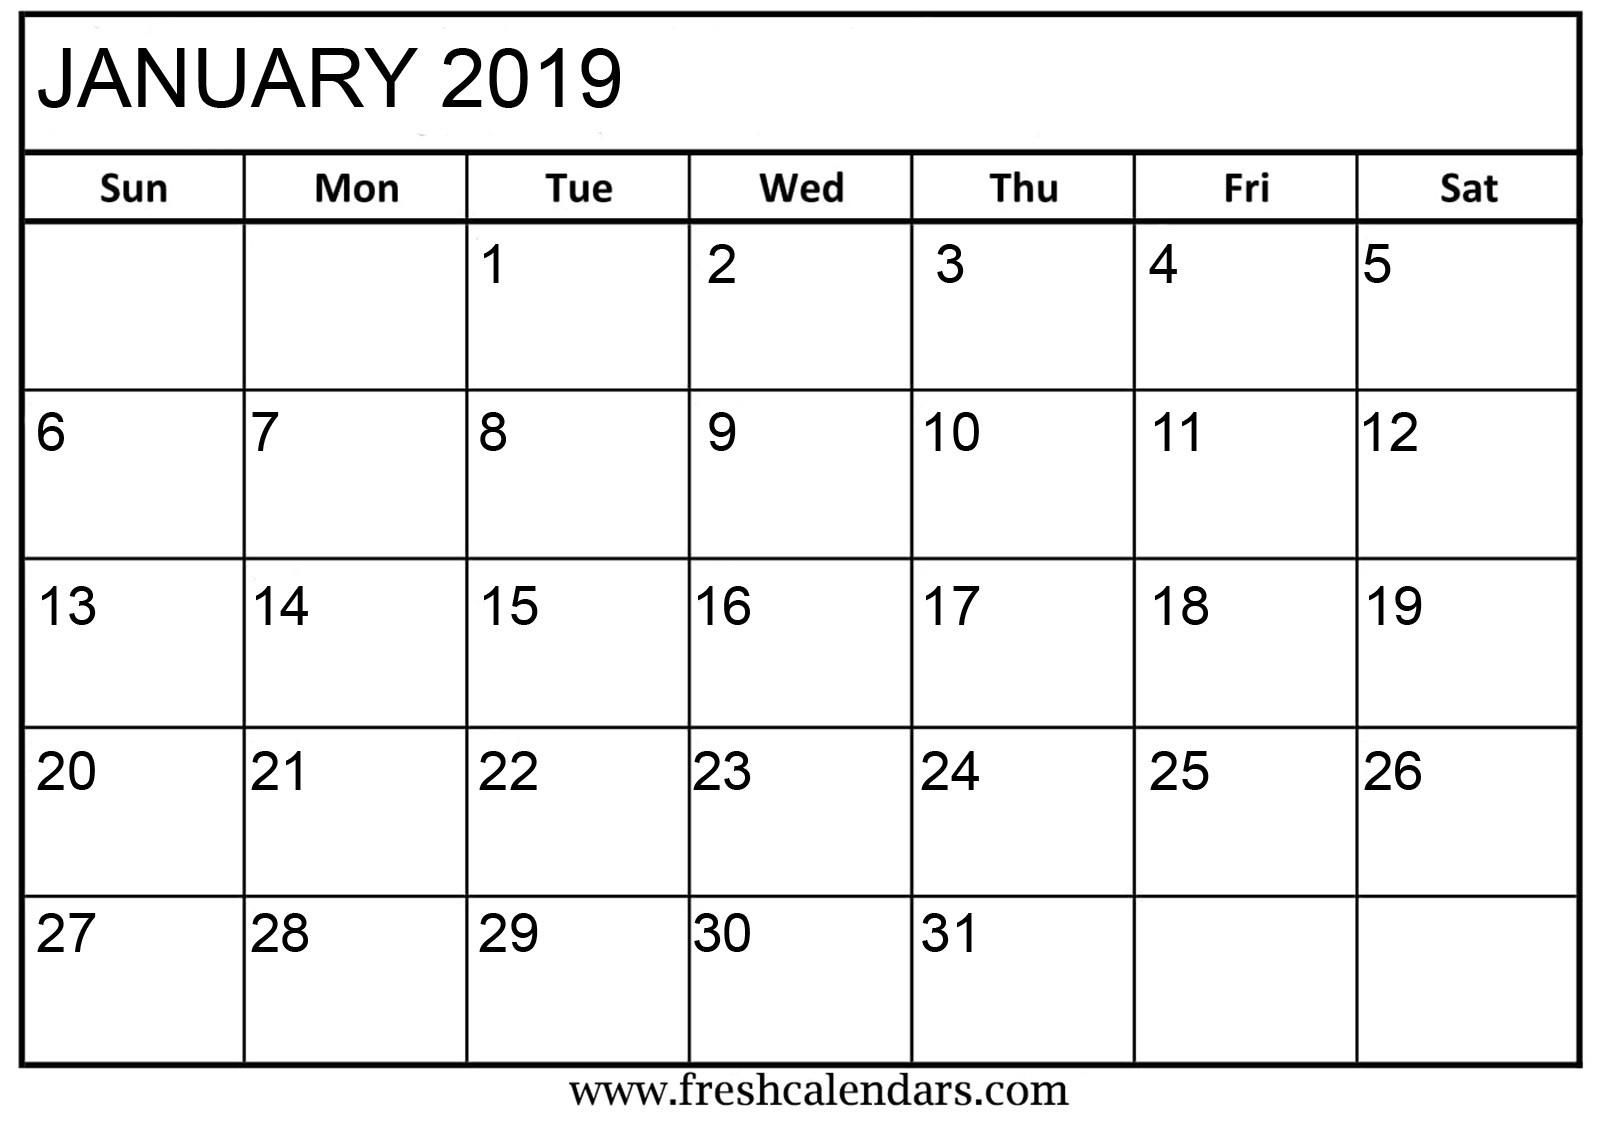 January 2019 Calendar Printable Fresh Calendars